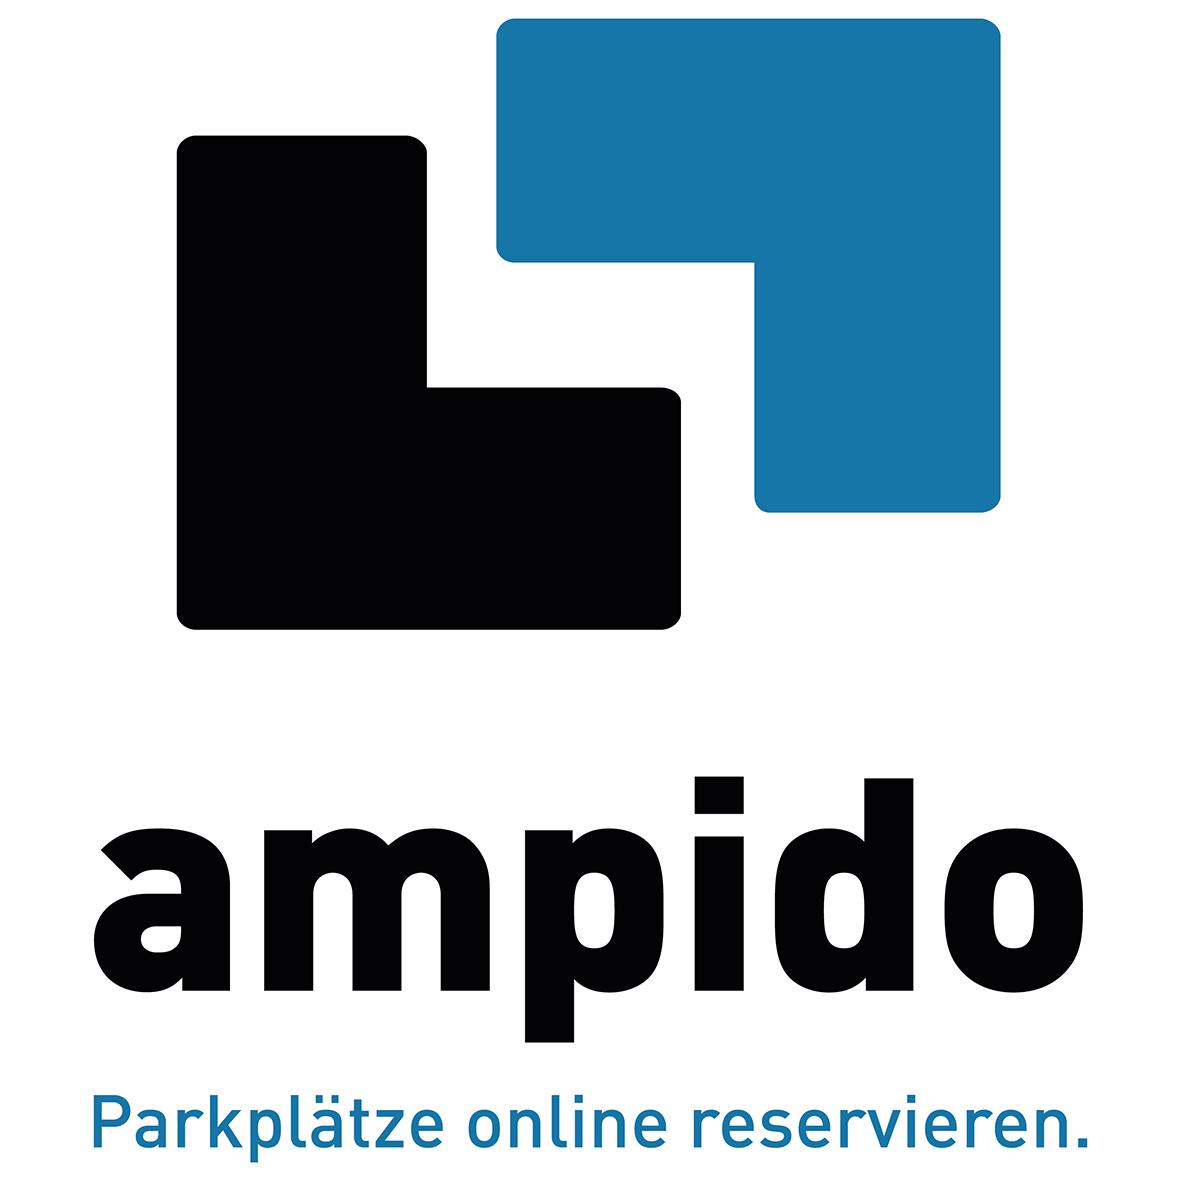 ampido Parkplatz